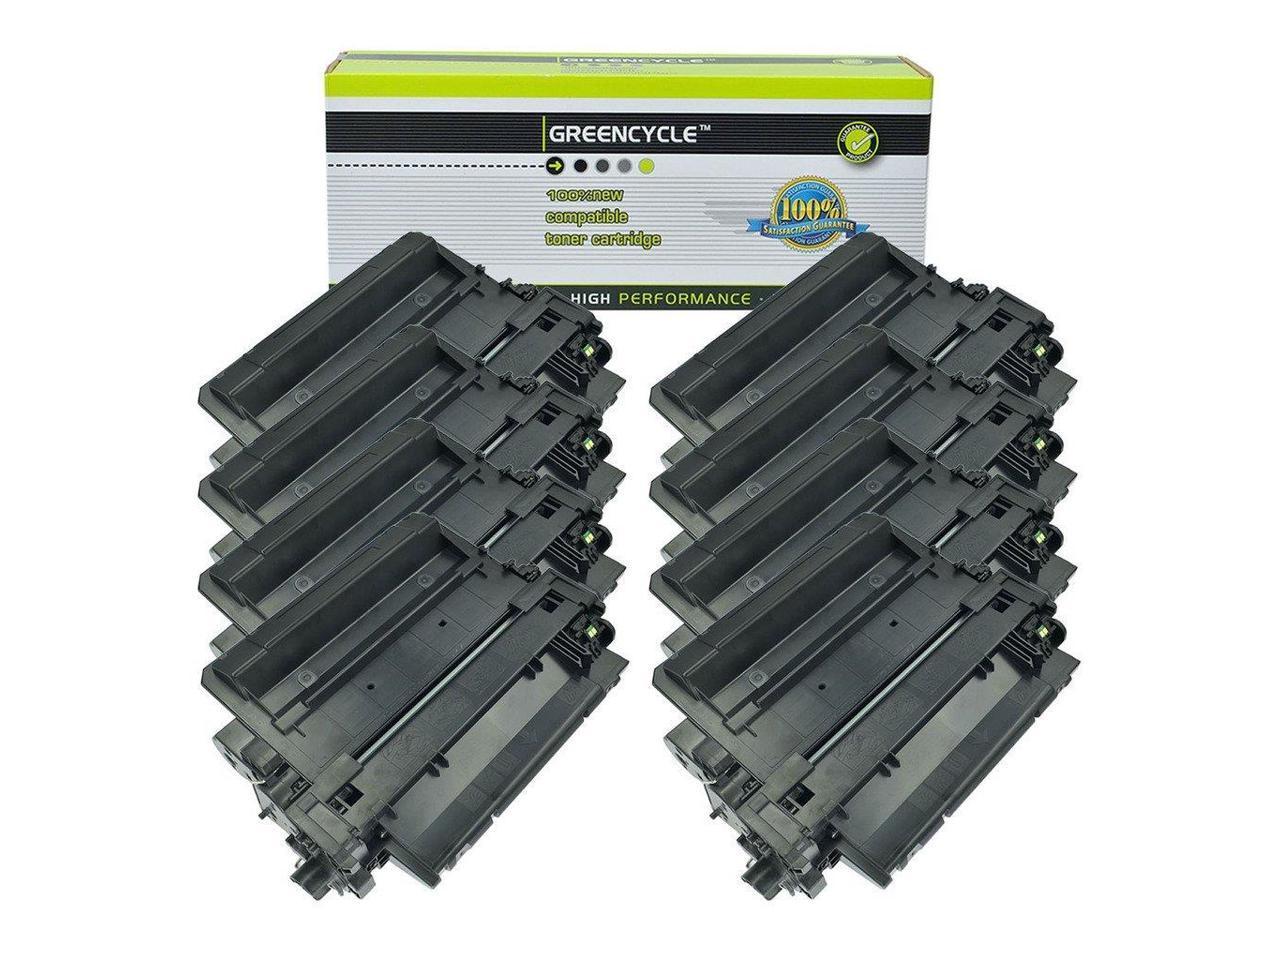 Black, 1-Pack Toner Bank Compatible Toner Cartridge Replacement for HP CE255X 55X CE255A 55A P3010 M521dn P3015d P3015n M525f M525dn